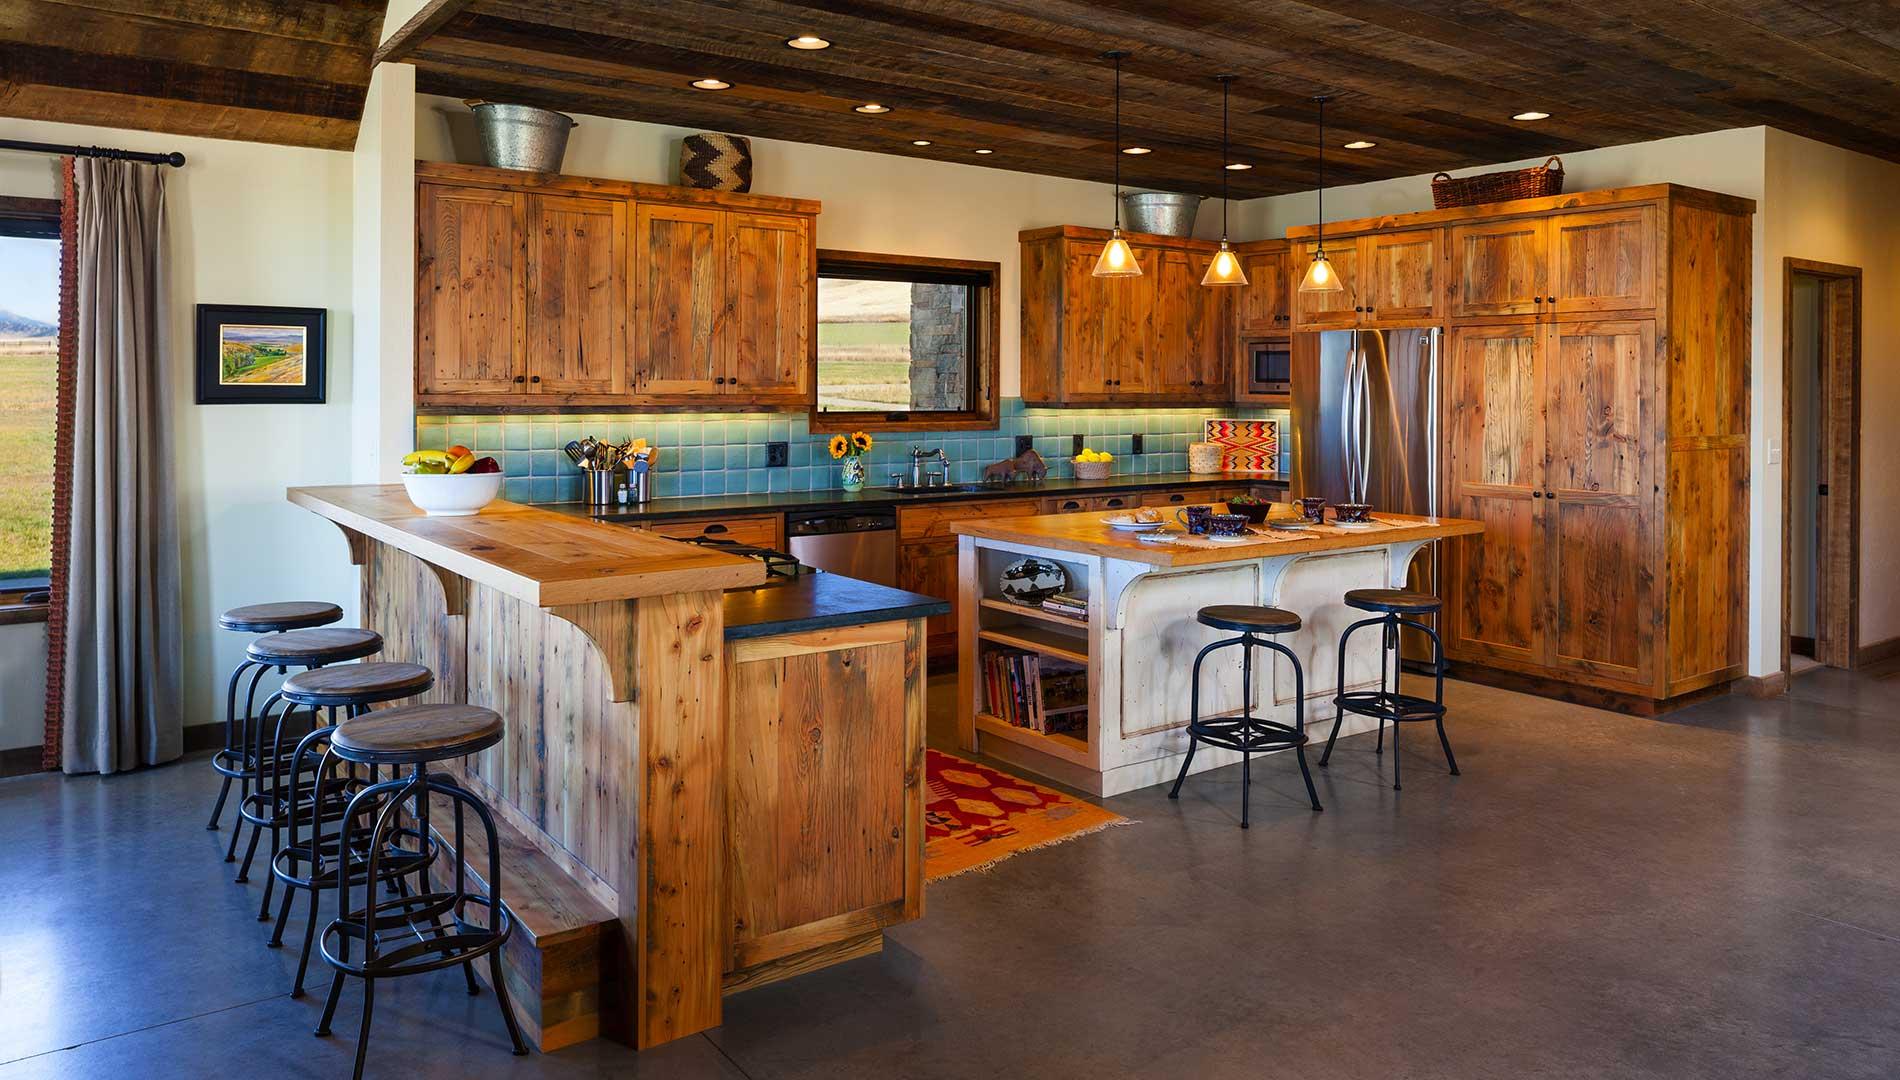 kitchen-shields-river-elizabeth-robb-interiors-1900x1080